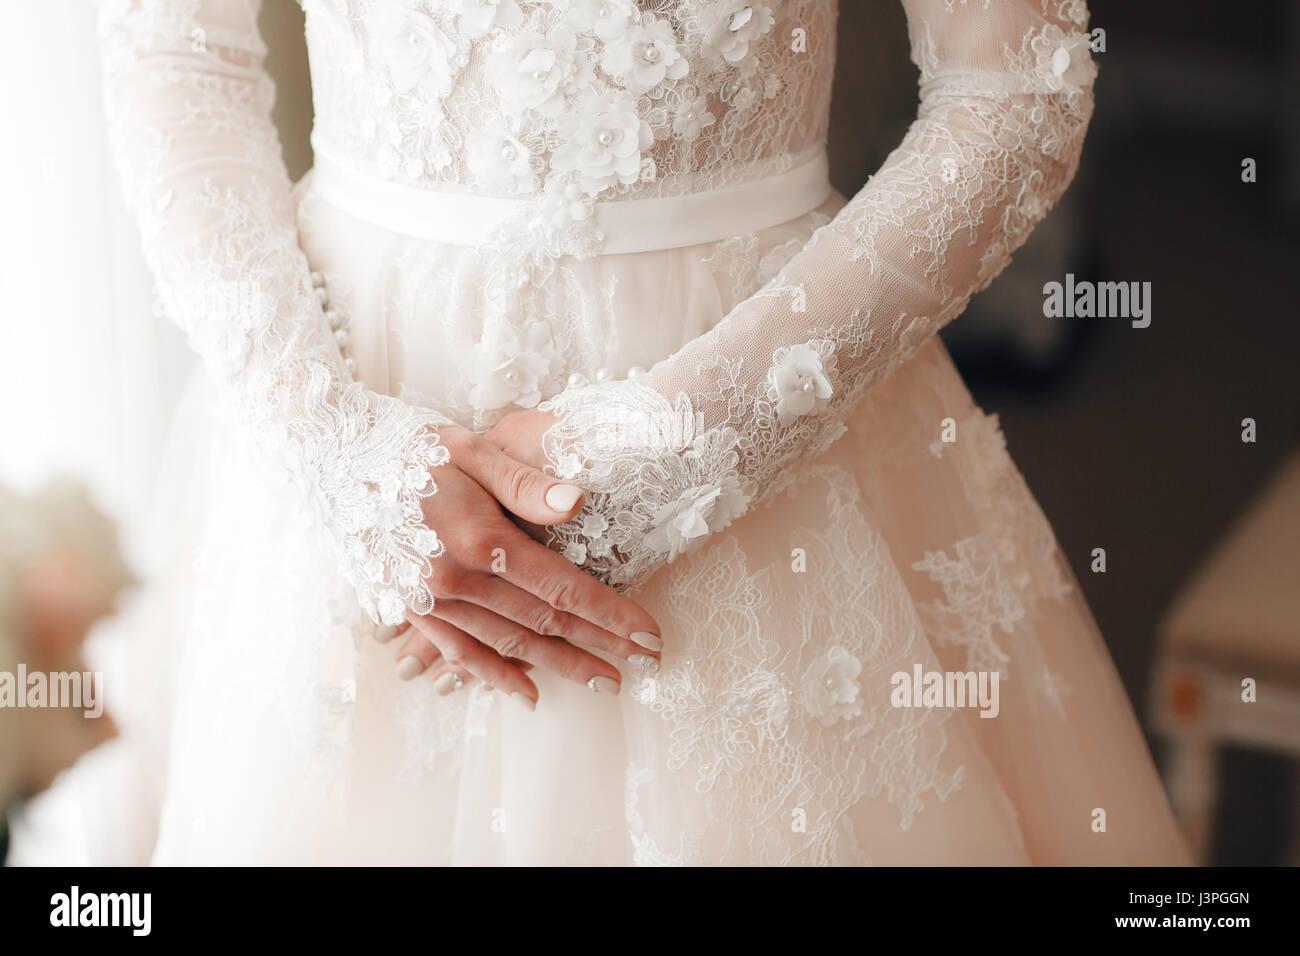 Closeup Bride Engagement Ring Stockfotos & Closeup Bride Engagement ...